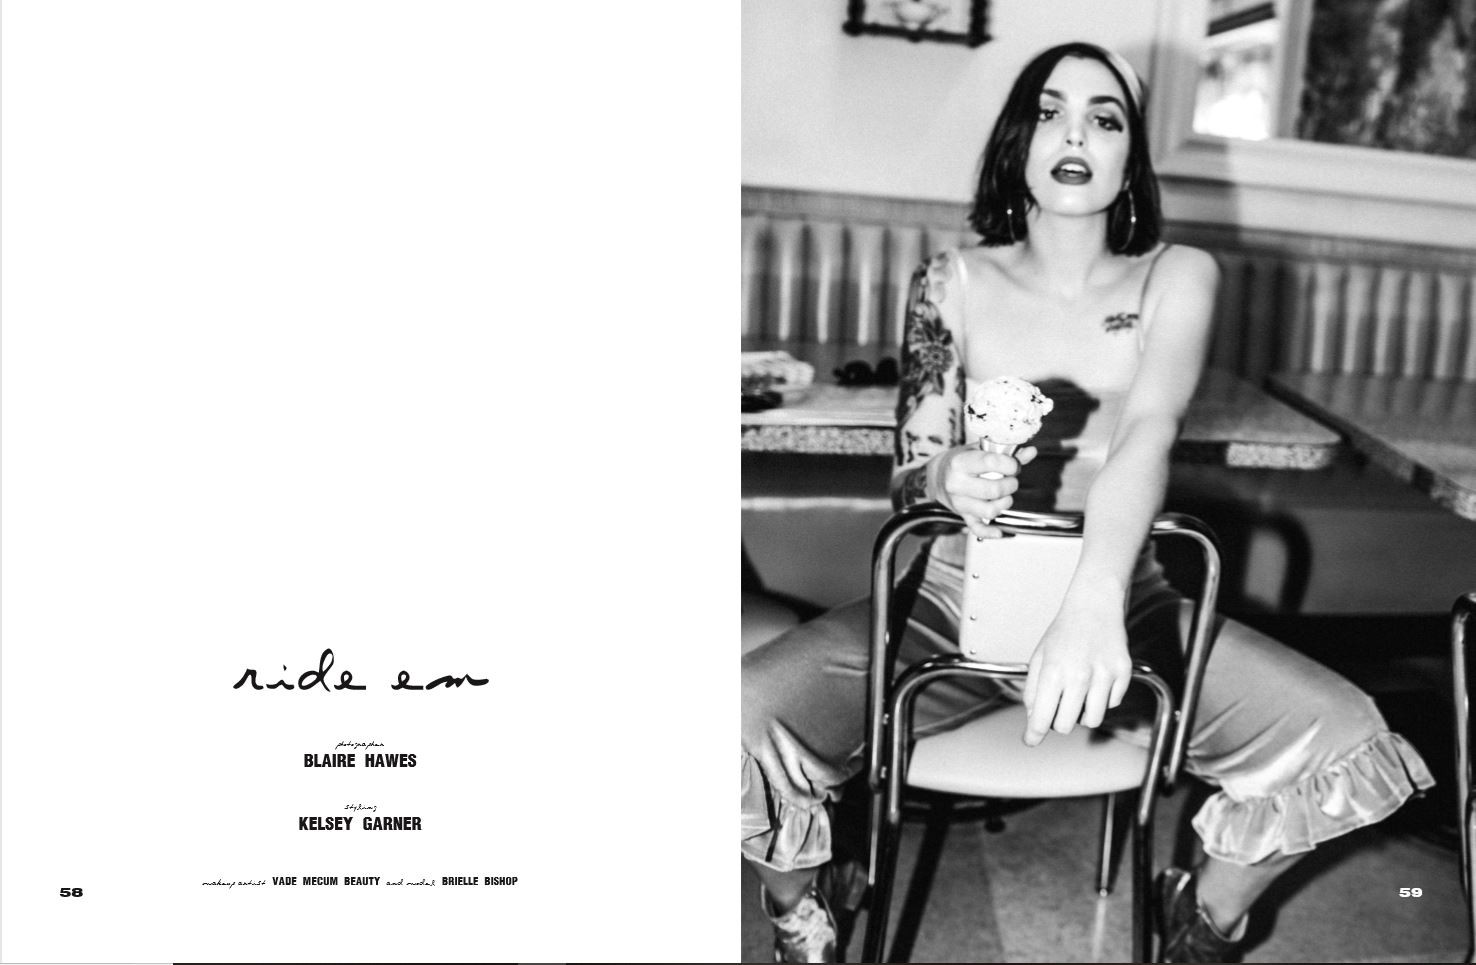 RIDE EM | LYUN Mag ISSUE 2